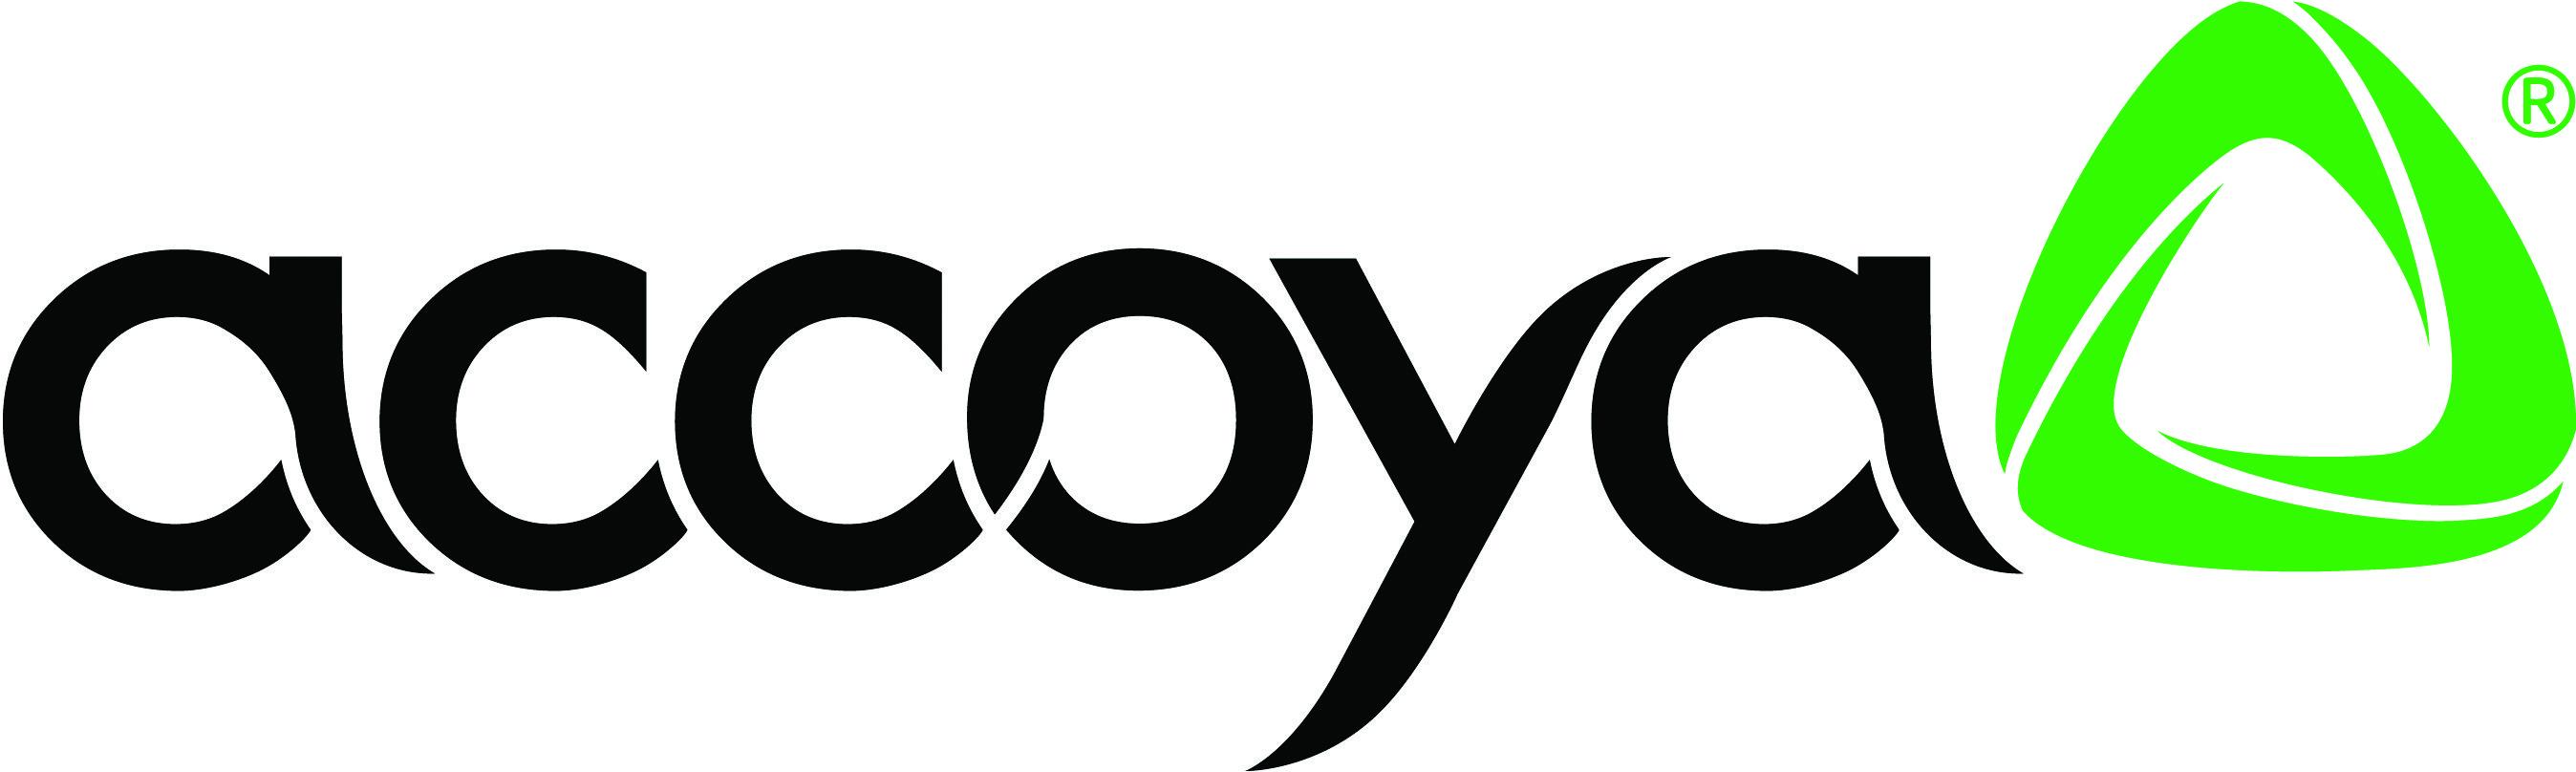 Accoya logo